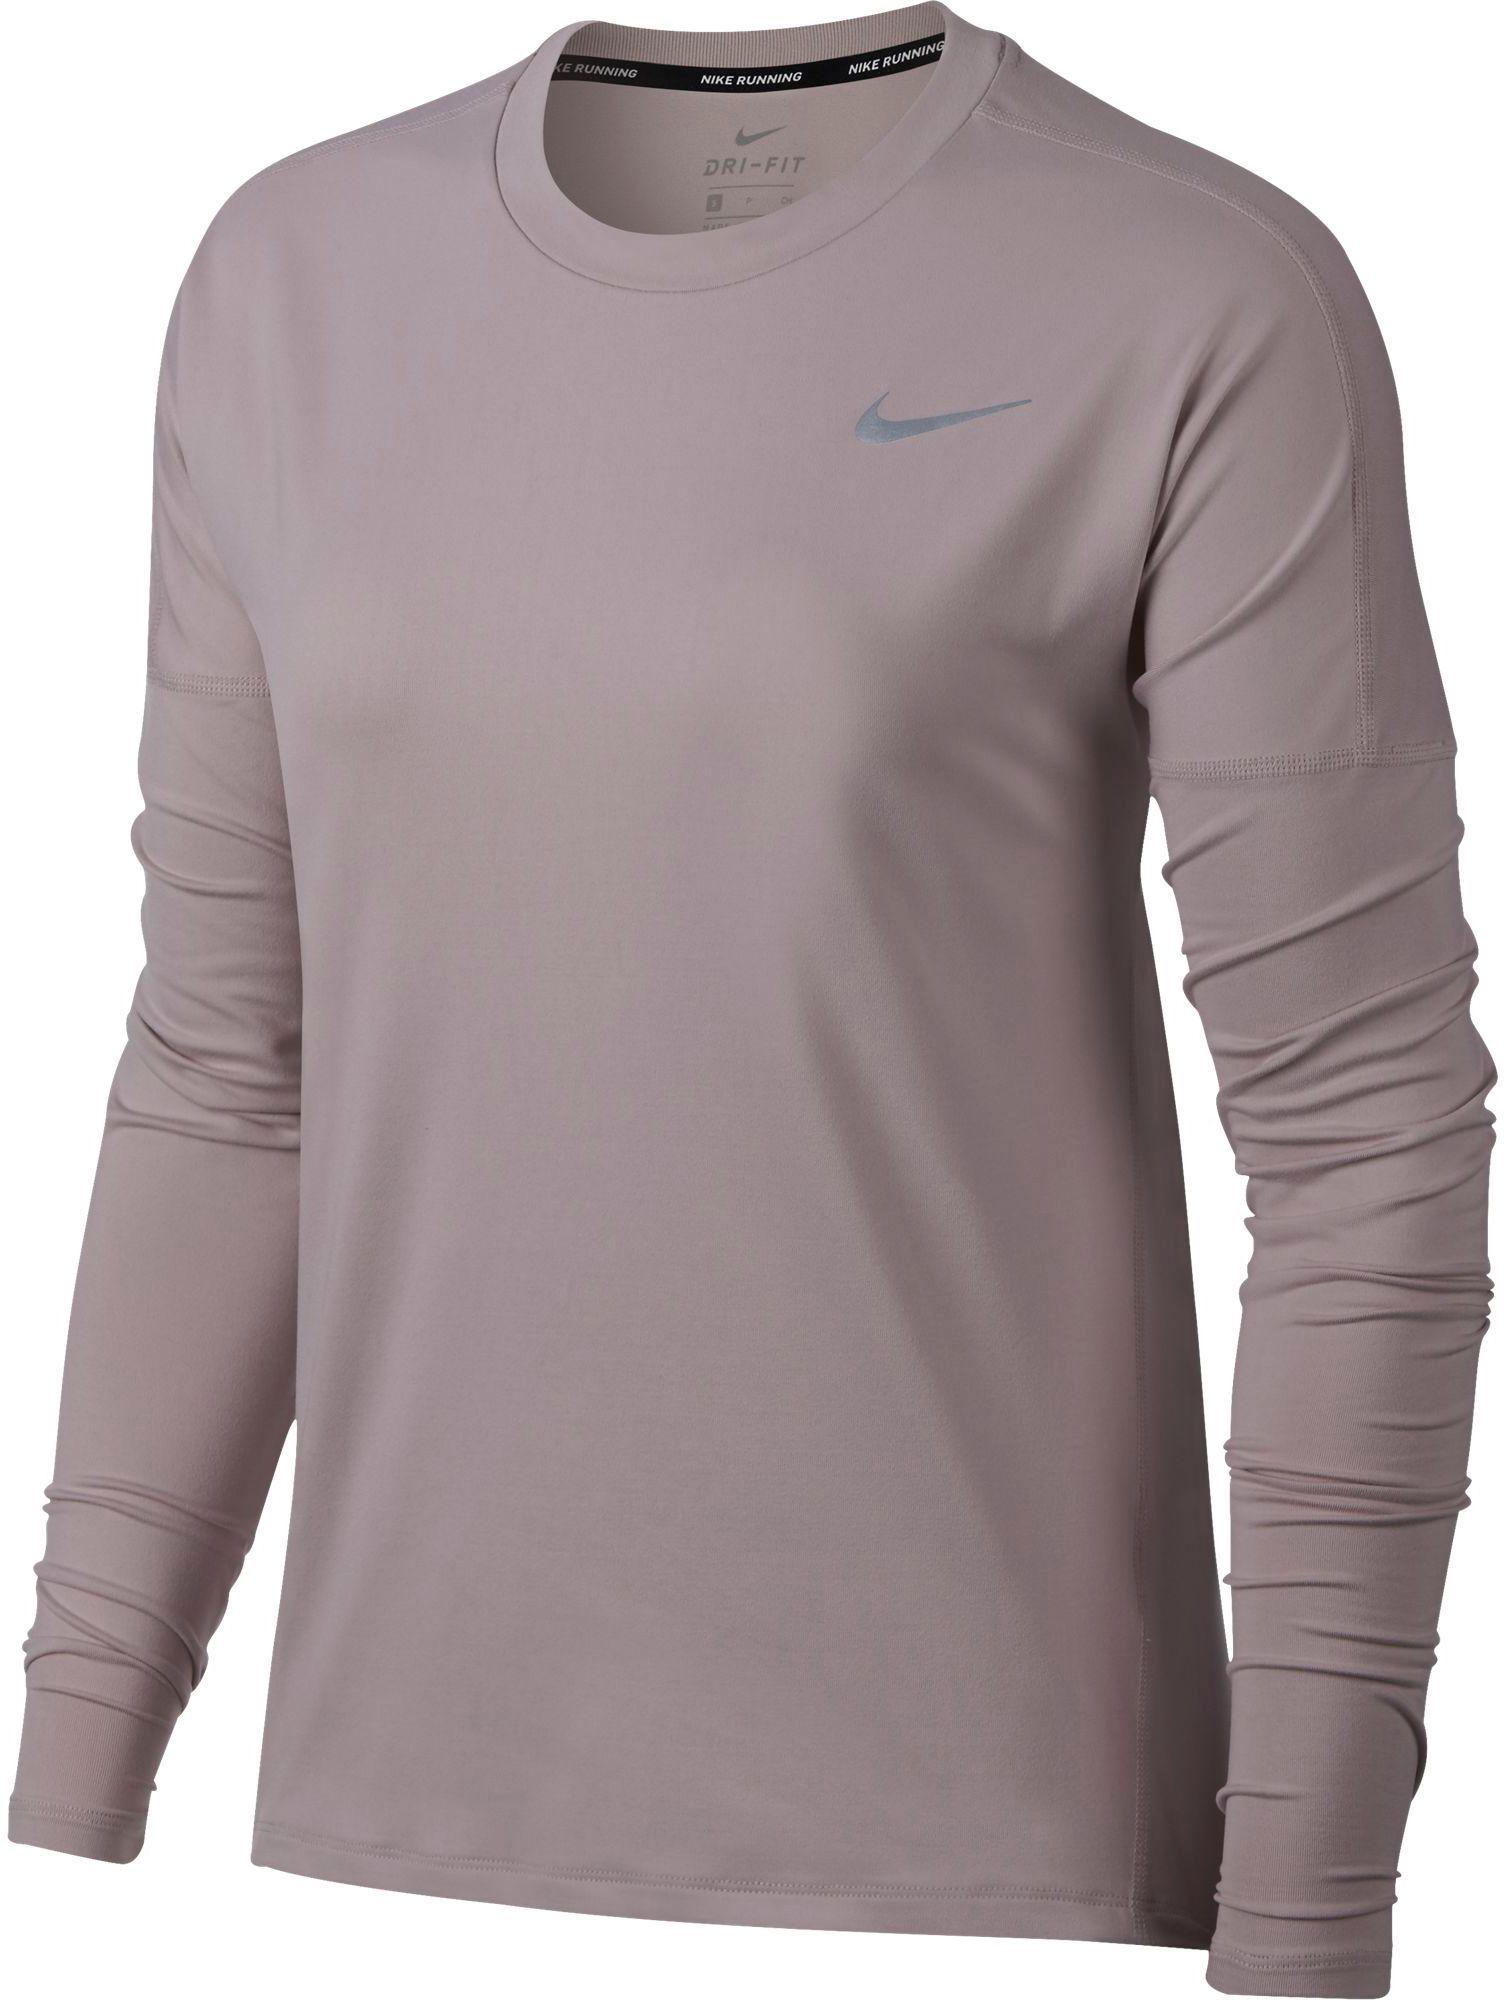 d8445a917b73b Nike Women's Dry Element Long Sleeve Running Shirt, Size: Medium, Particle  Rose/